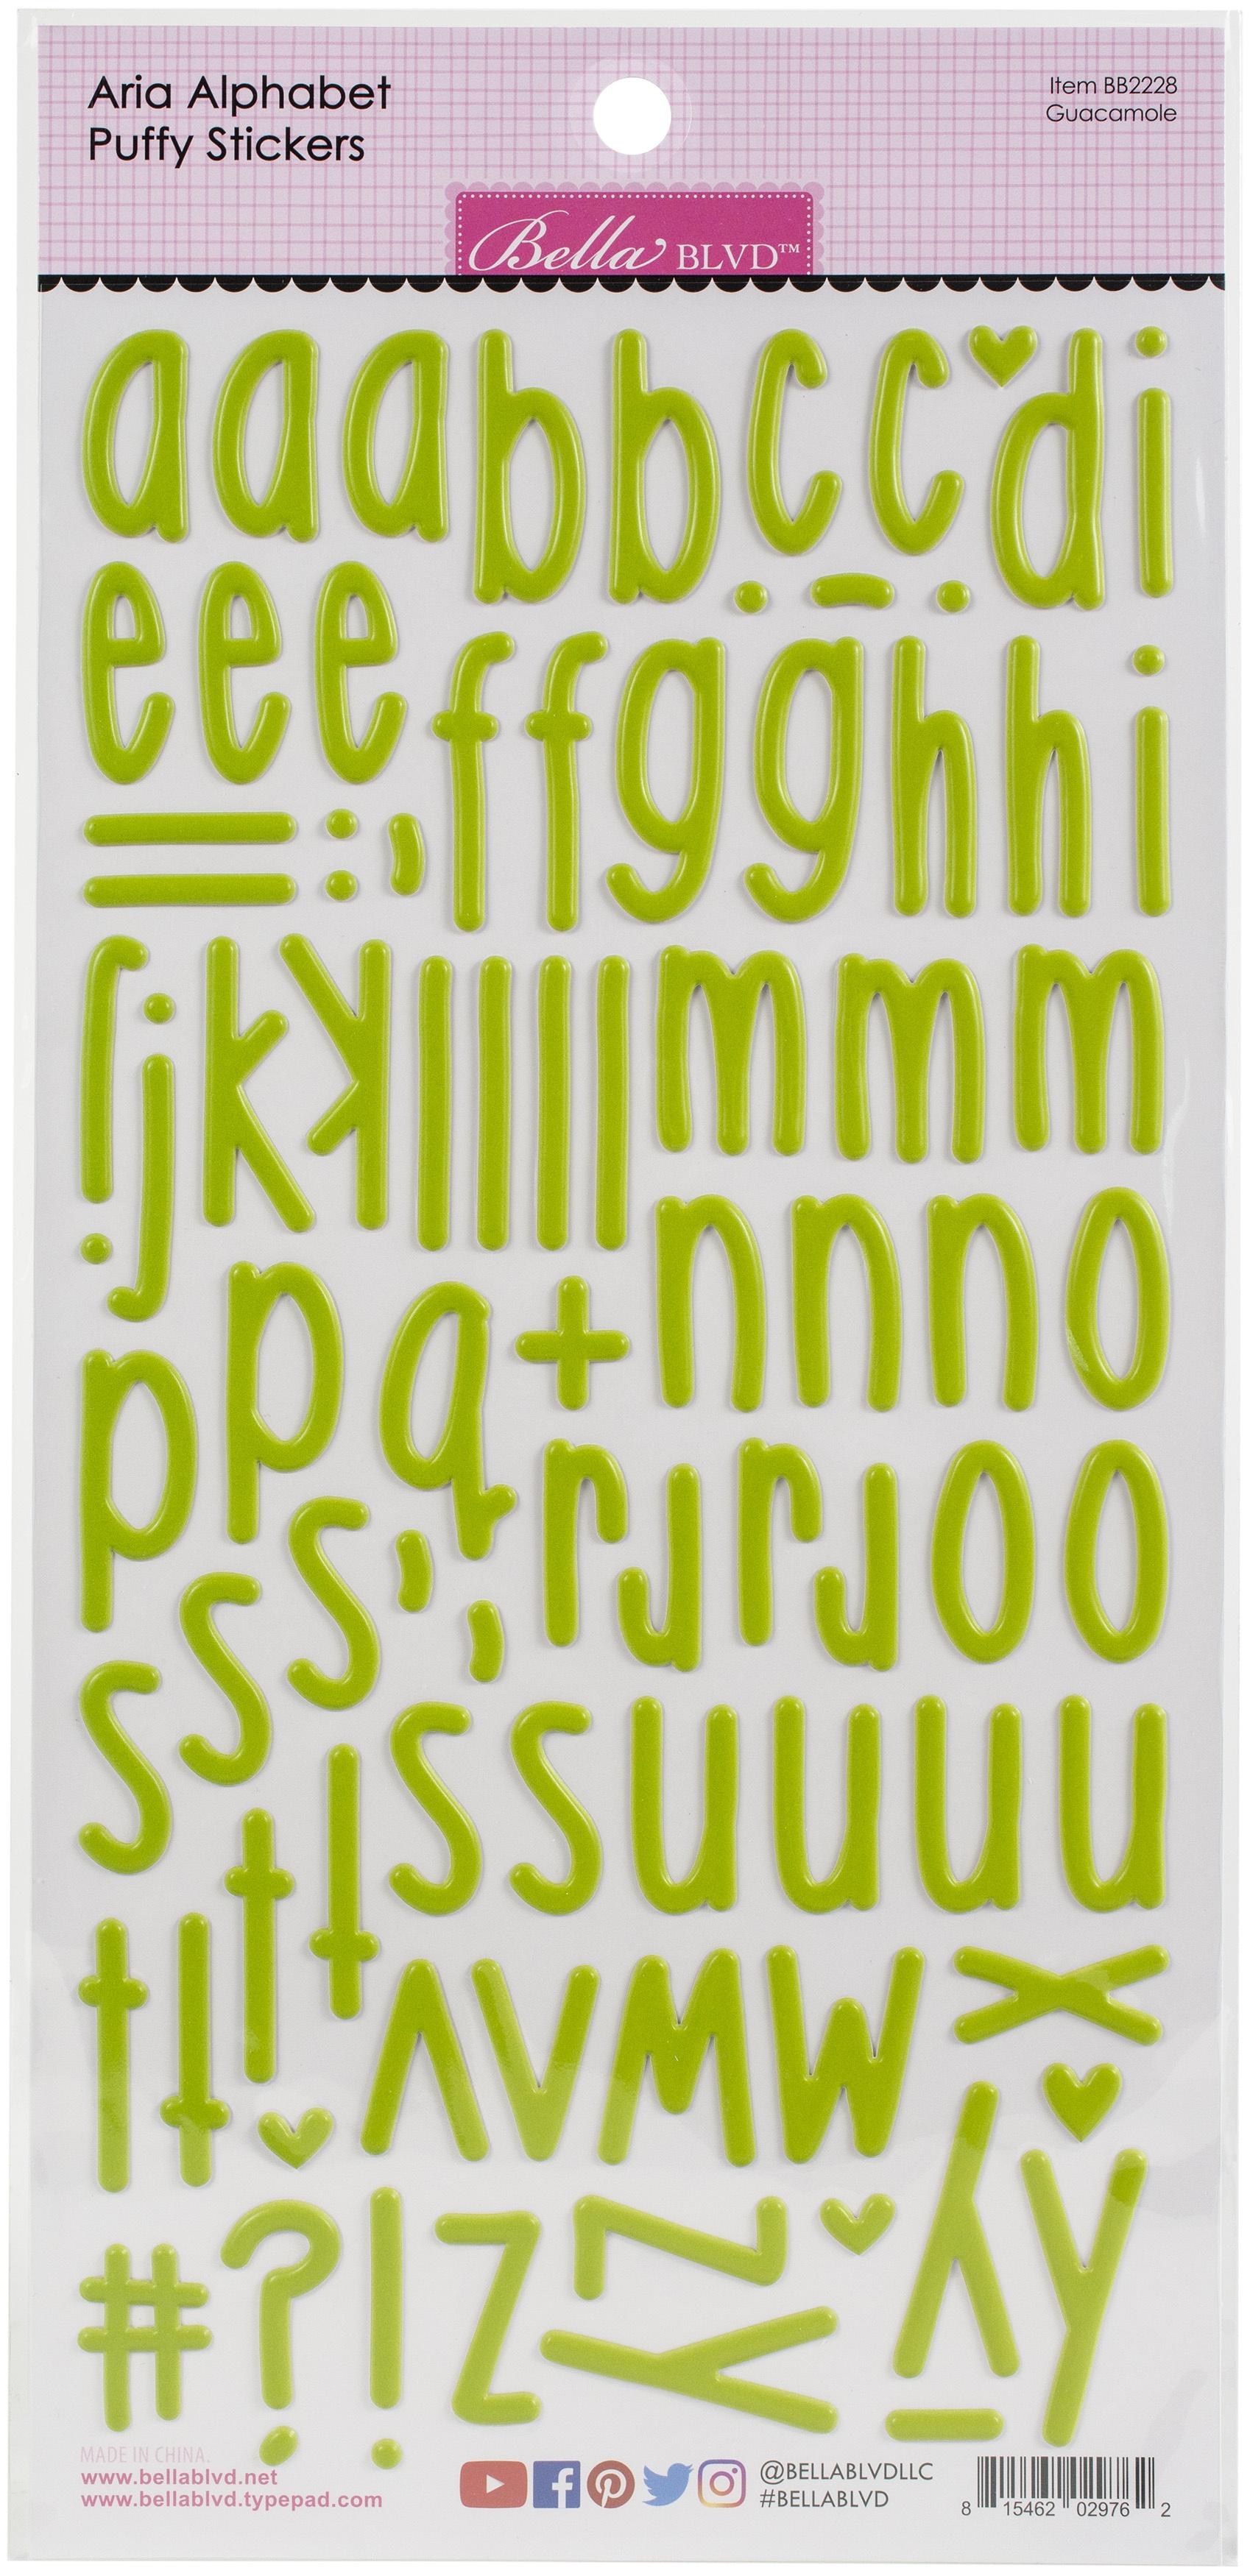 Aria Alpha Puffy Stickers Guacamole